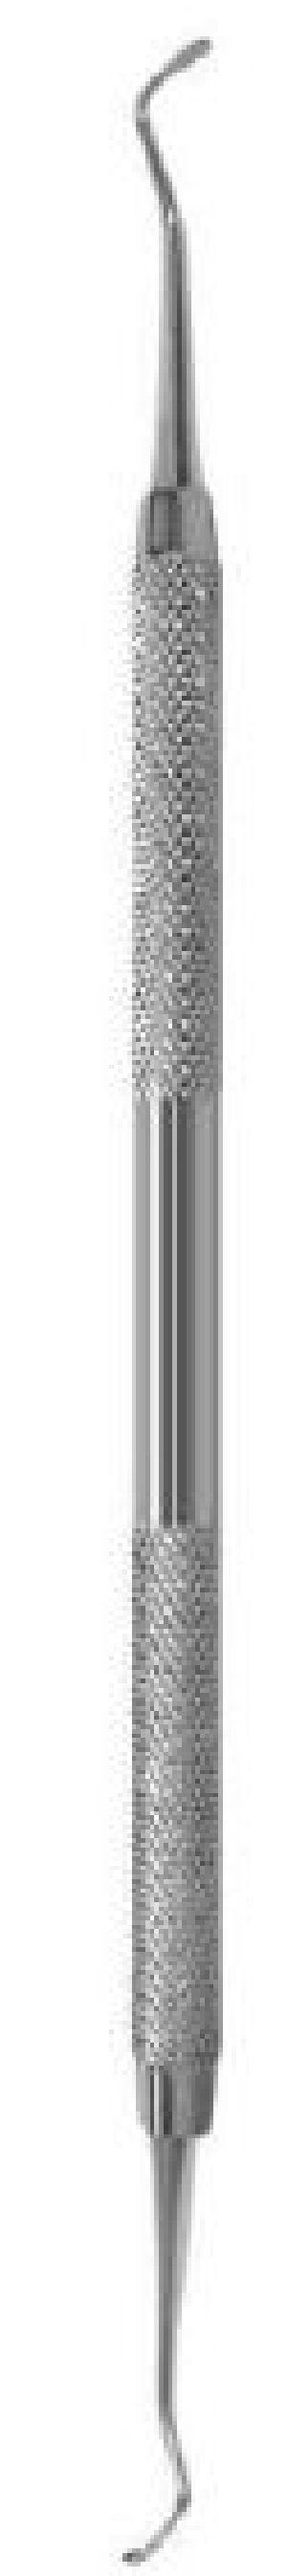 Membrane Placement Instrument 01